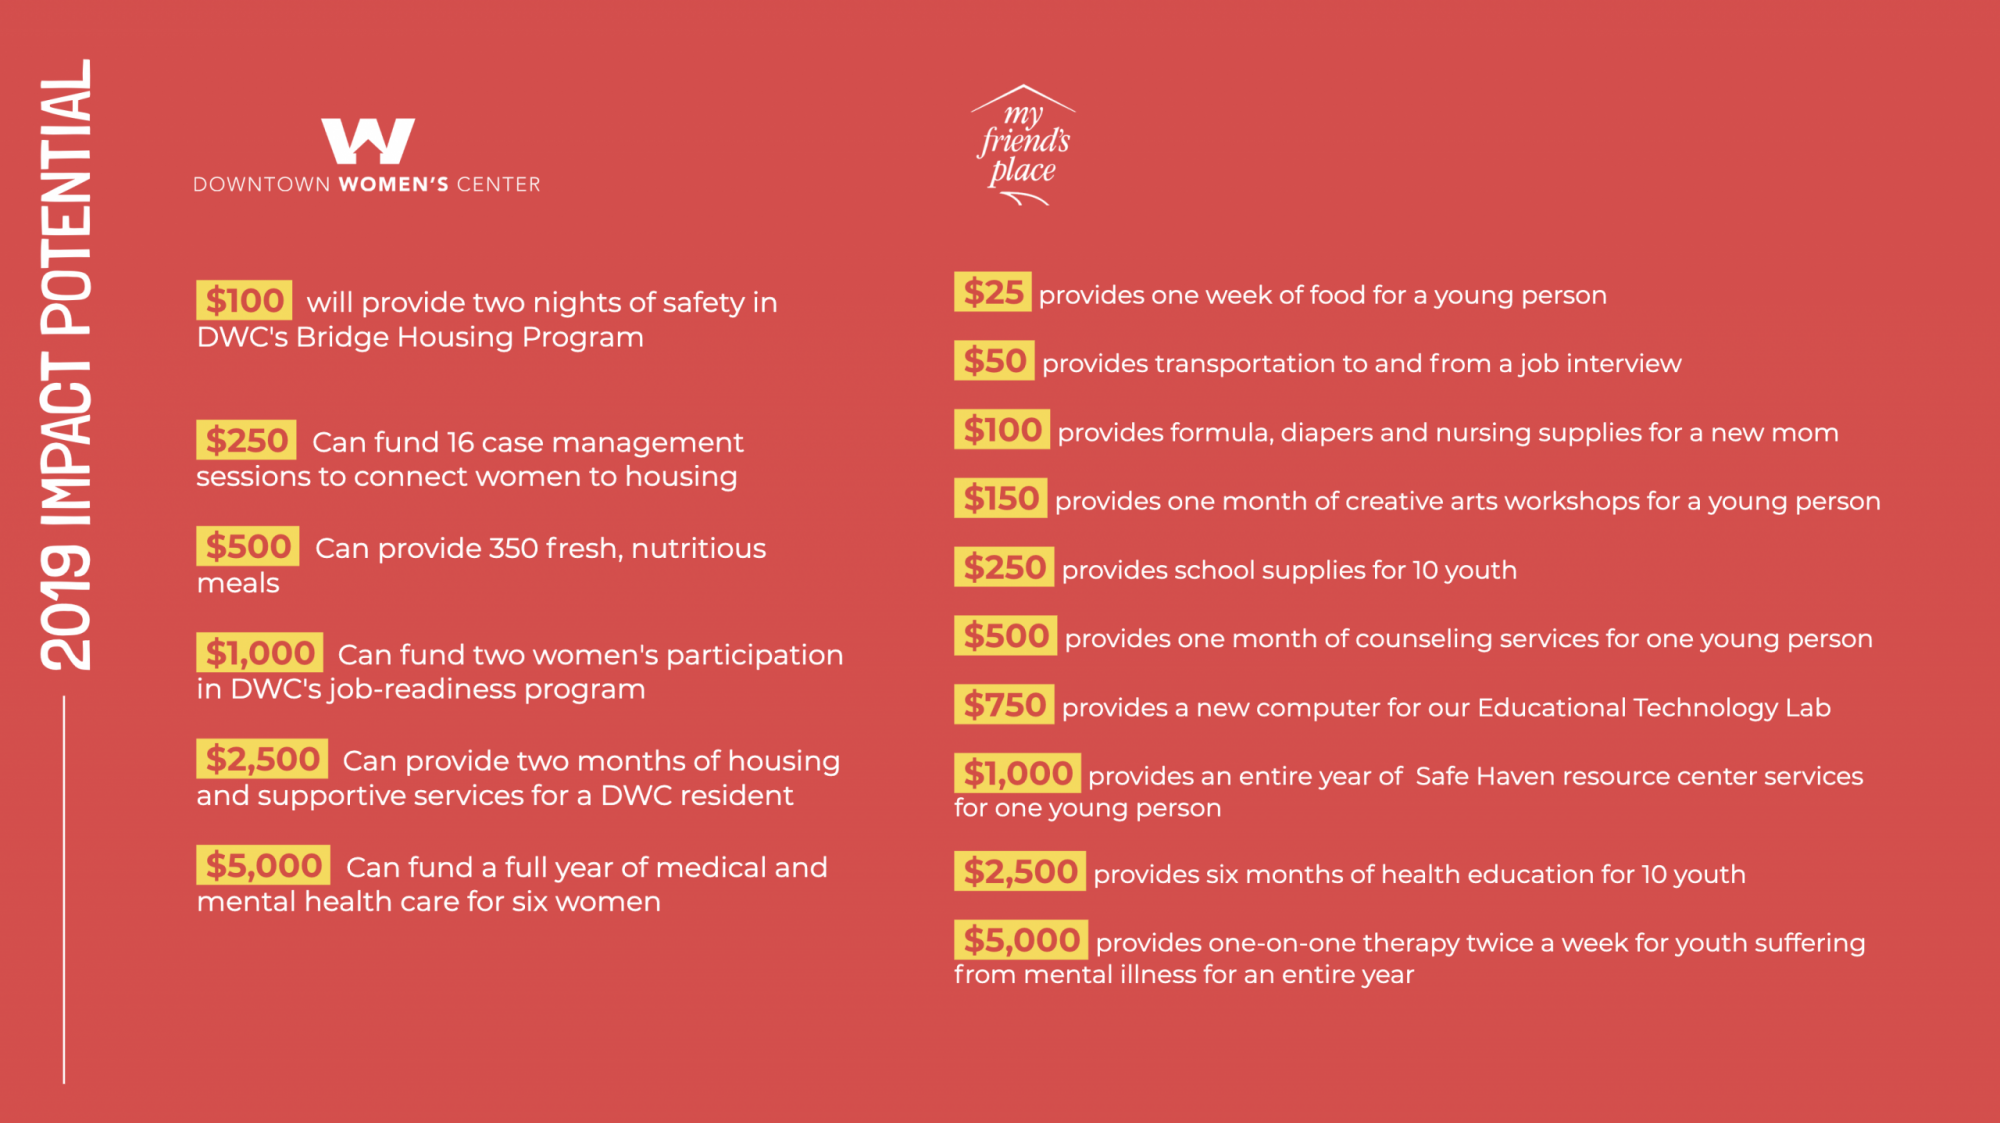 LA Gives Back 2019 Impact Infographic